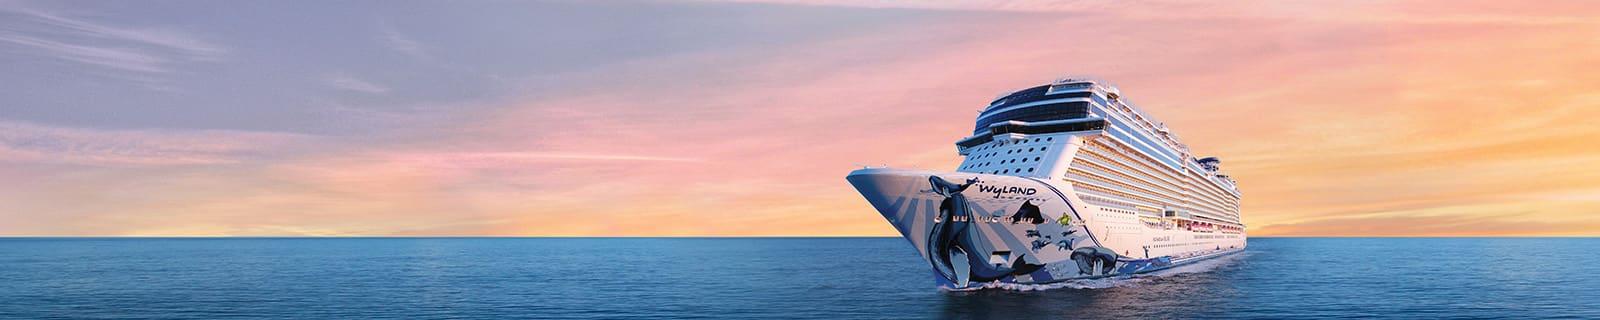 MI.Página de Cruise Freedom1600x320